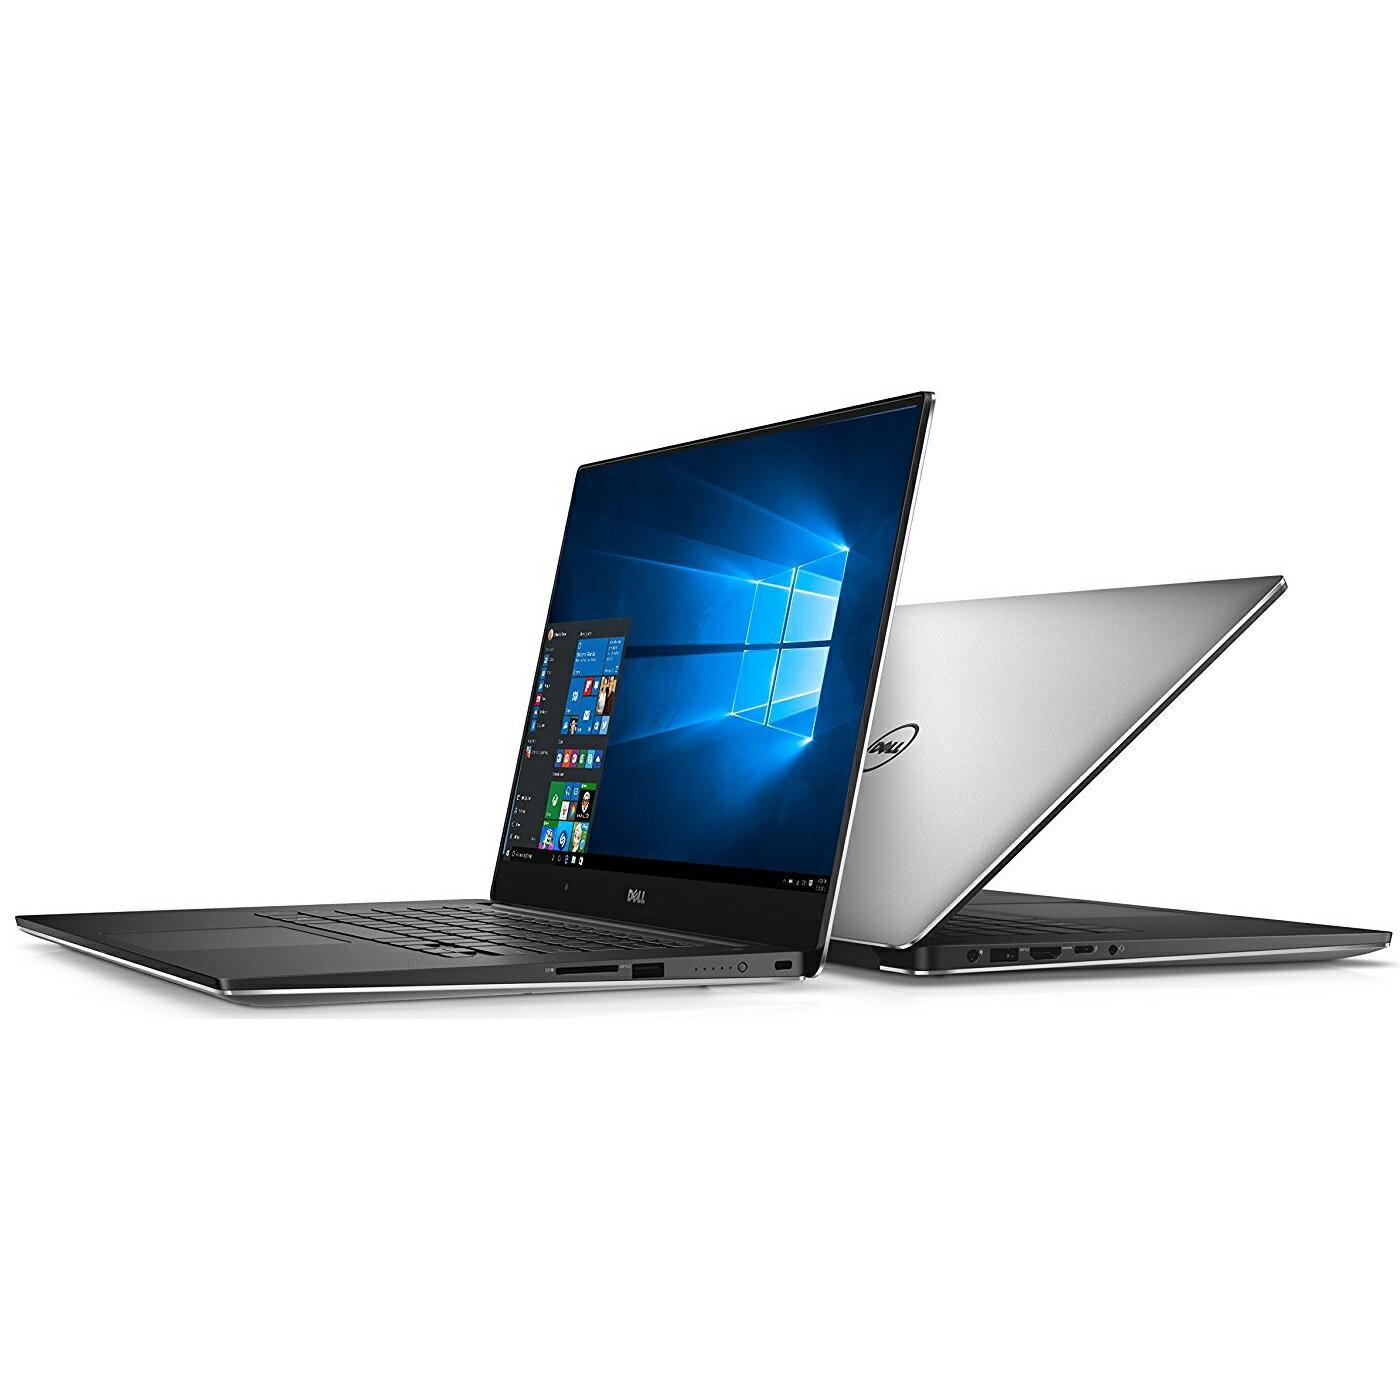 Dell XPS9560-5000SLV 15 6 4k Touch Display Intel i5-7300HQ 8GB, 256GB Laptop